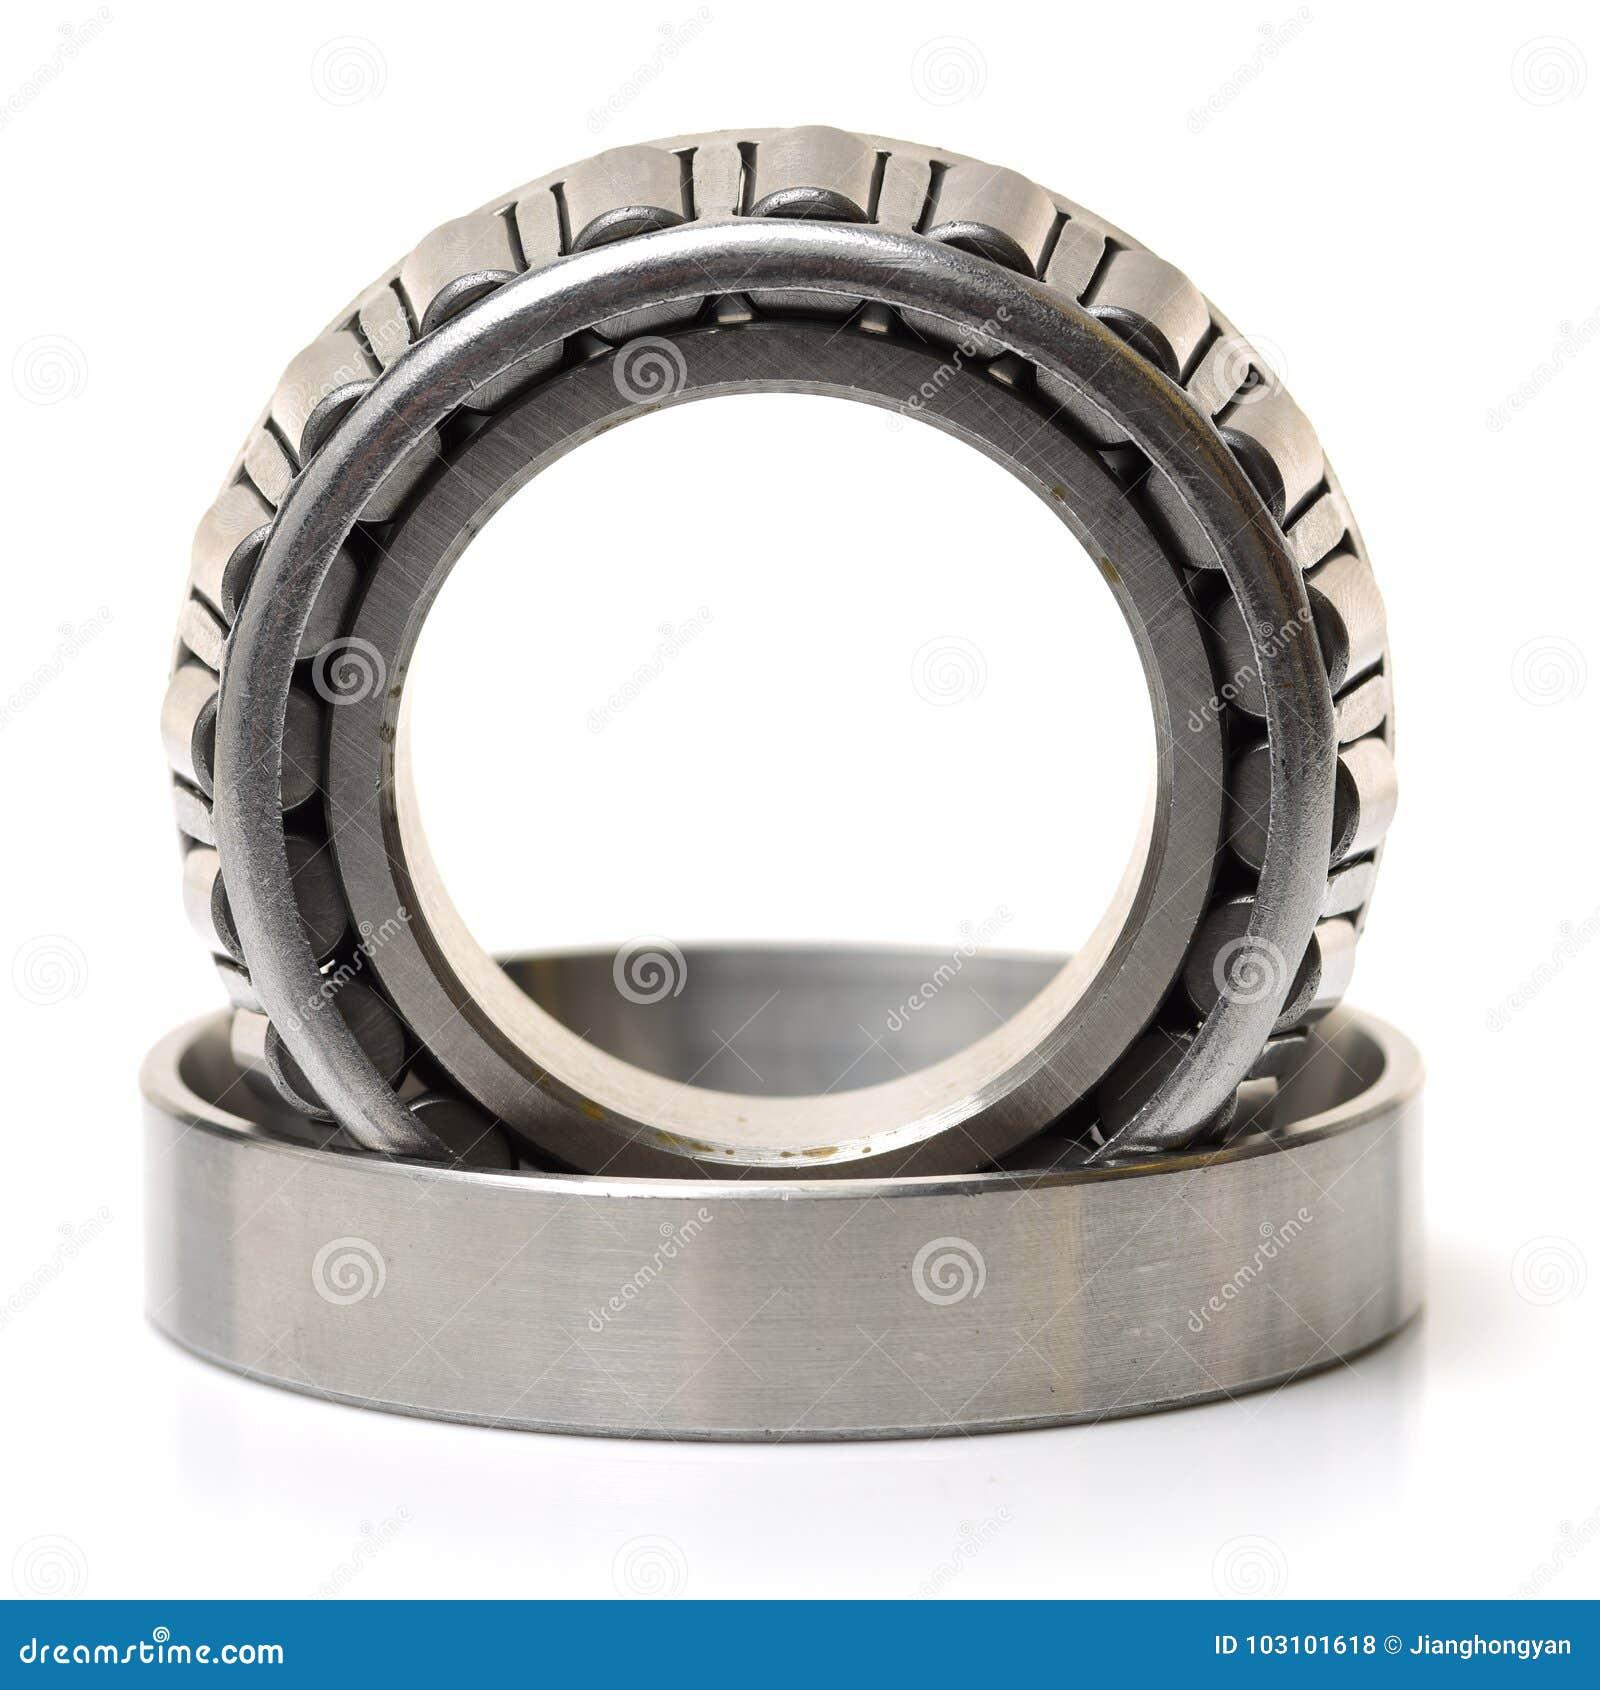 Cone bearing.